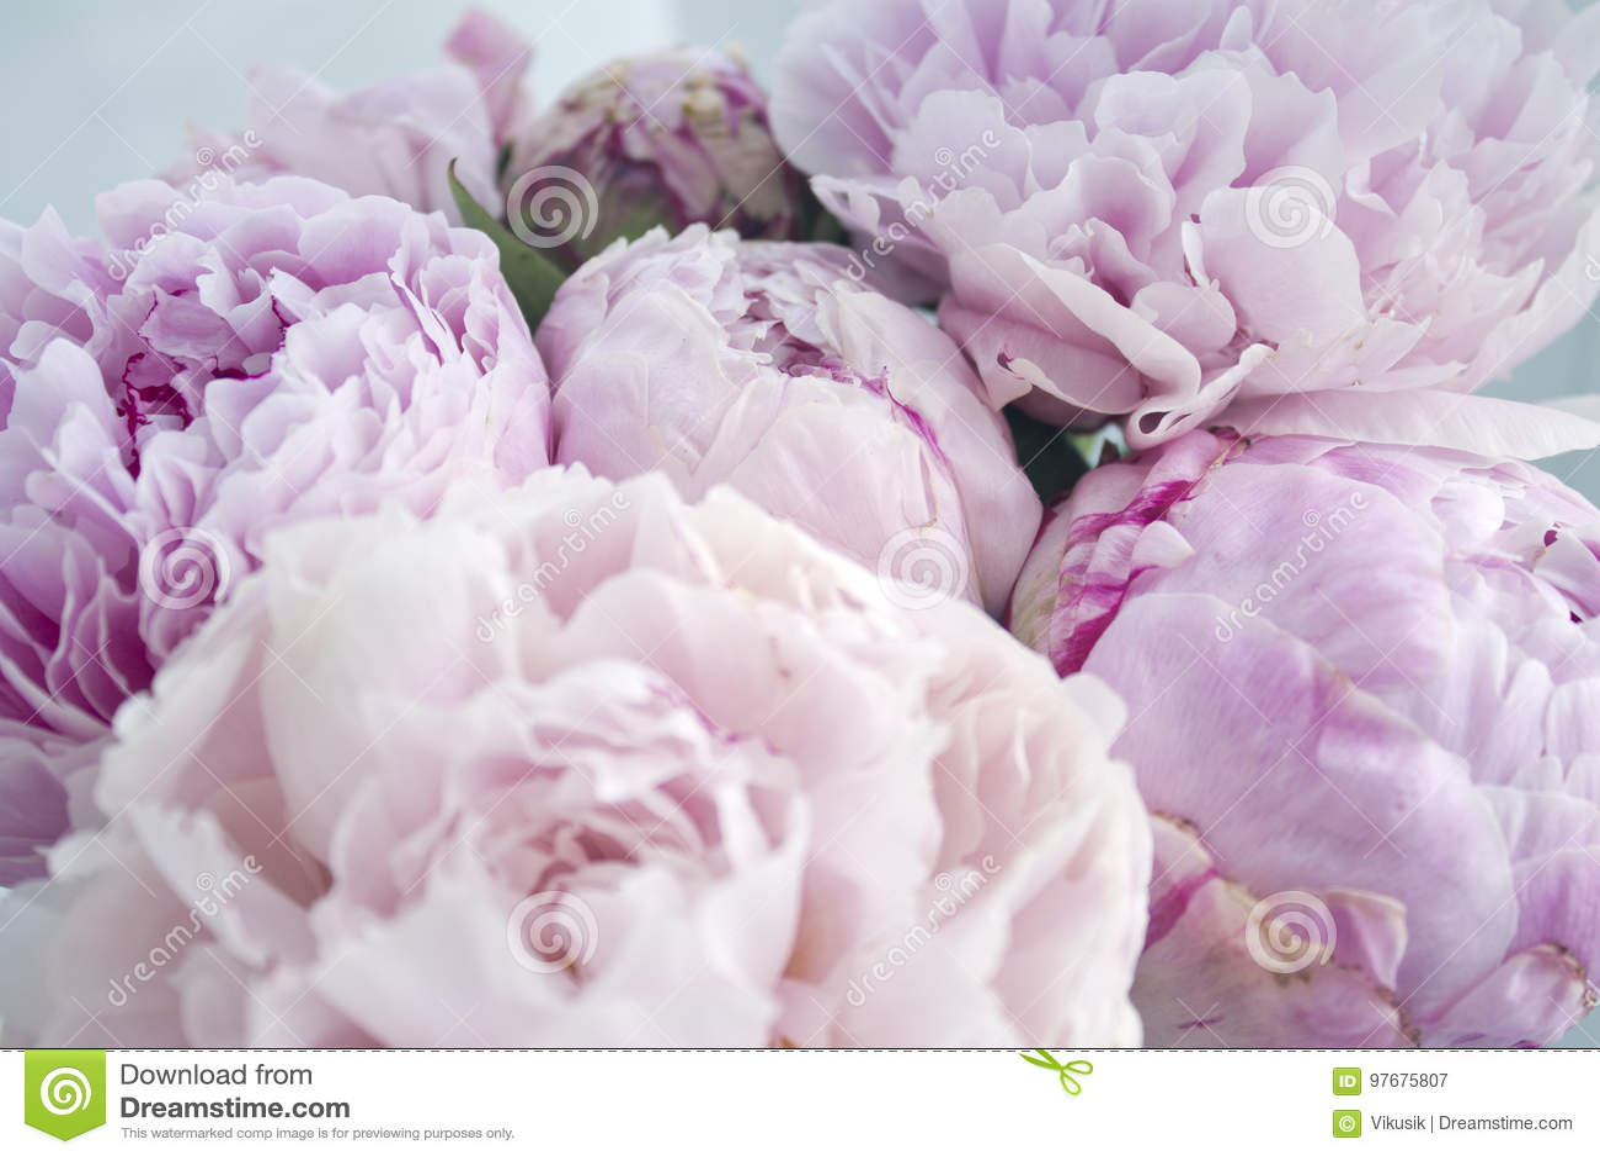 Closeup Fresh Bunch Of Pink Peonies Peony Flowers Card